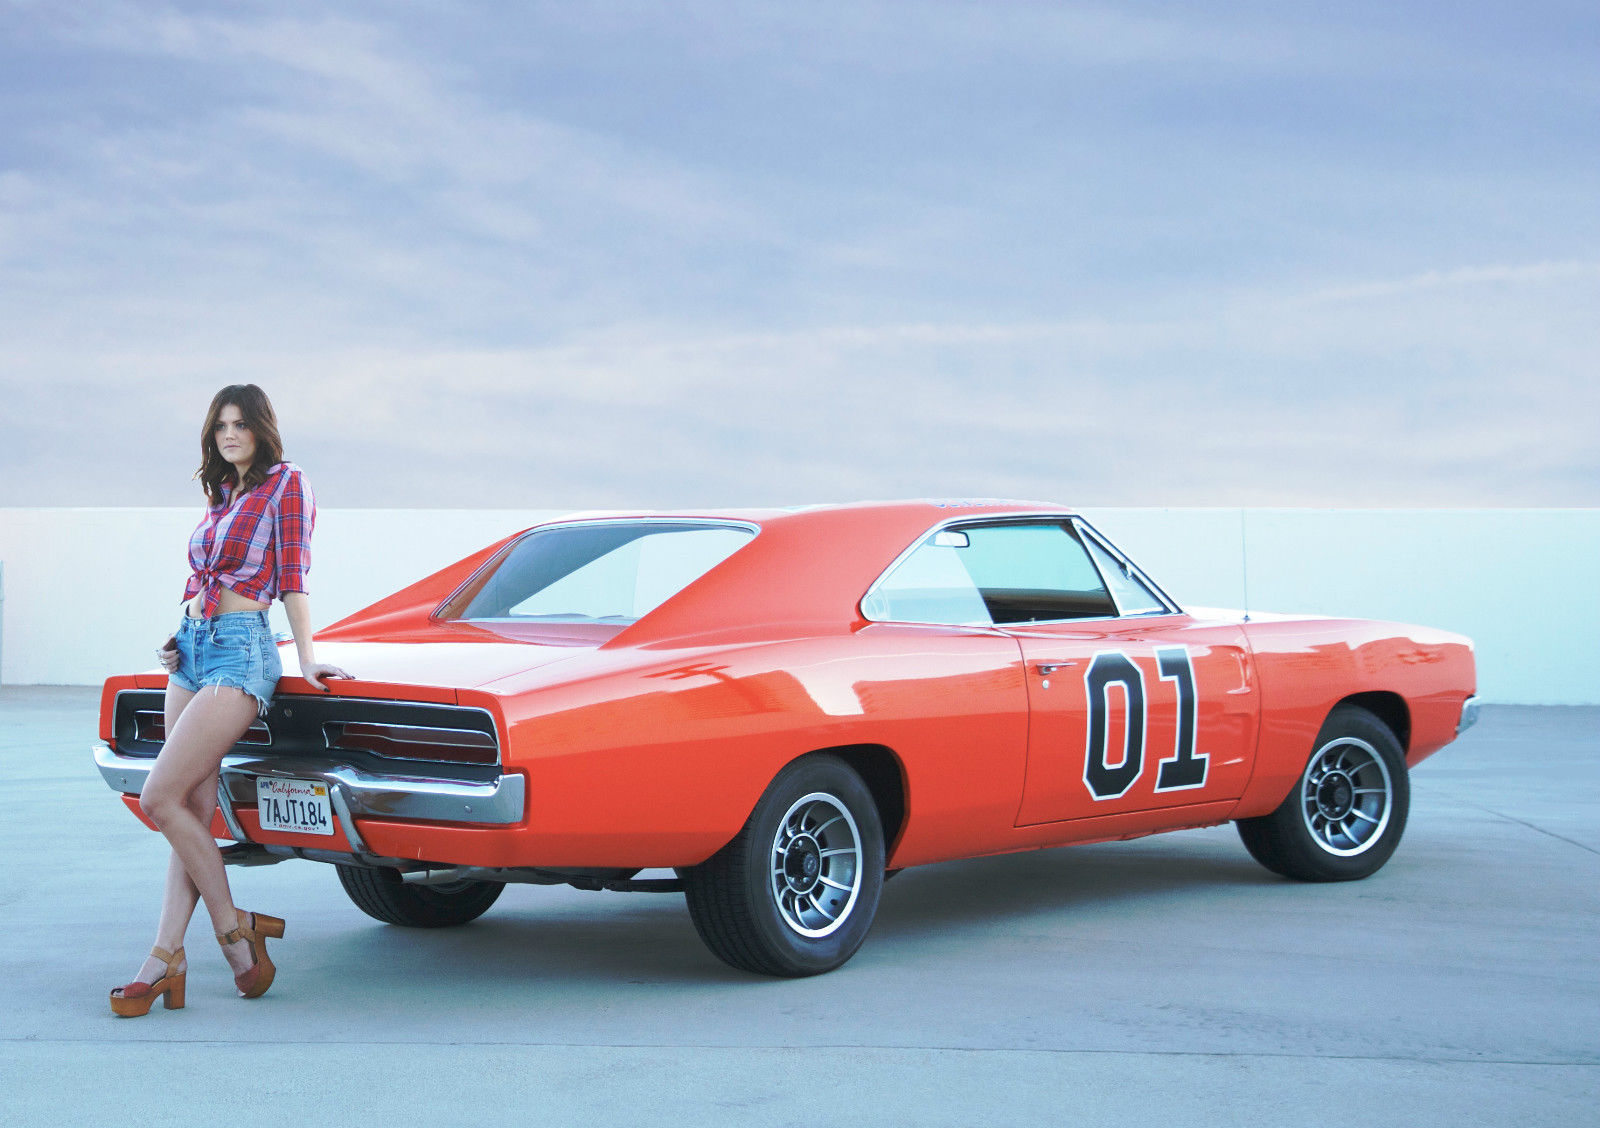 1969 Dodge Charger Quot General Lee Quot Dukes Of Hazzard